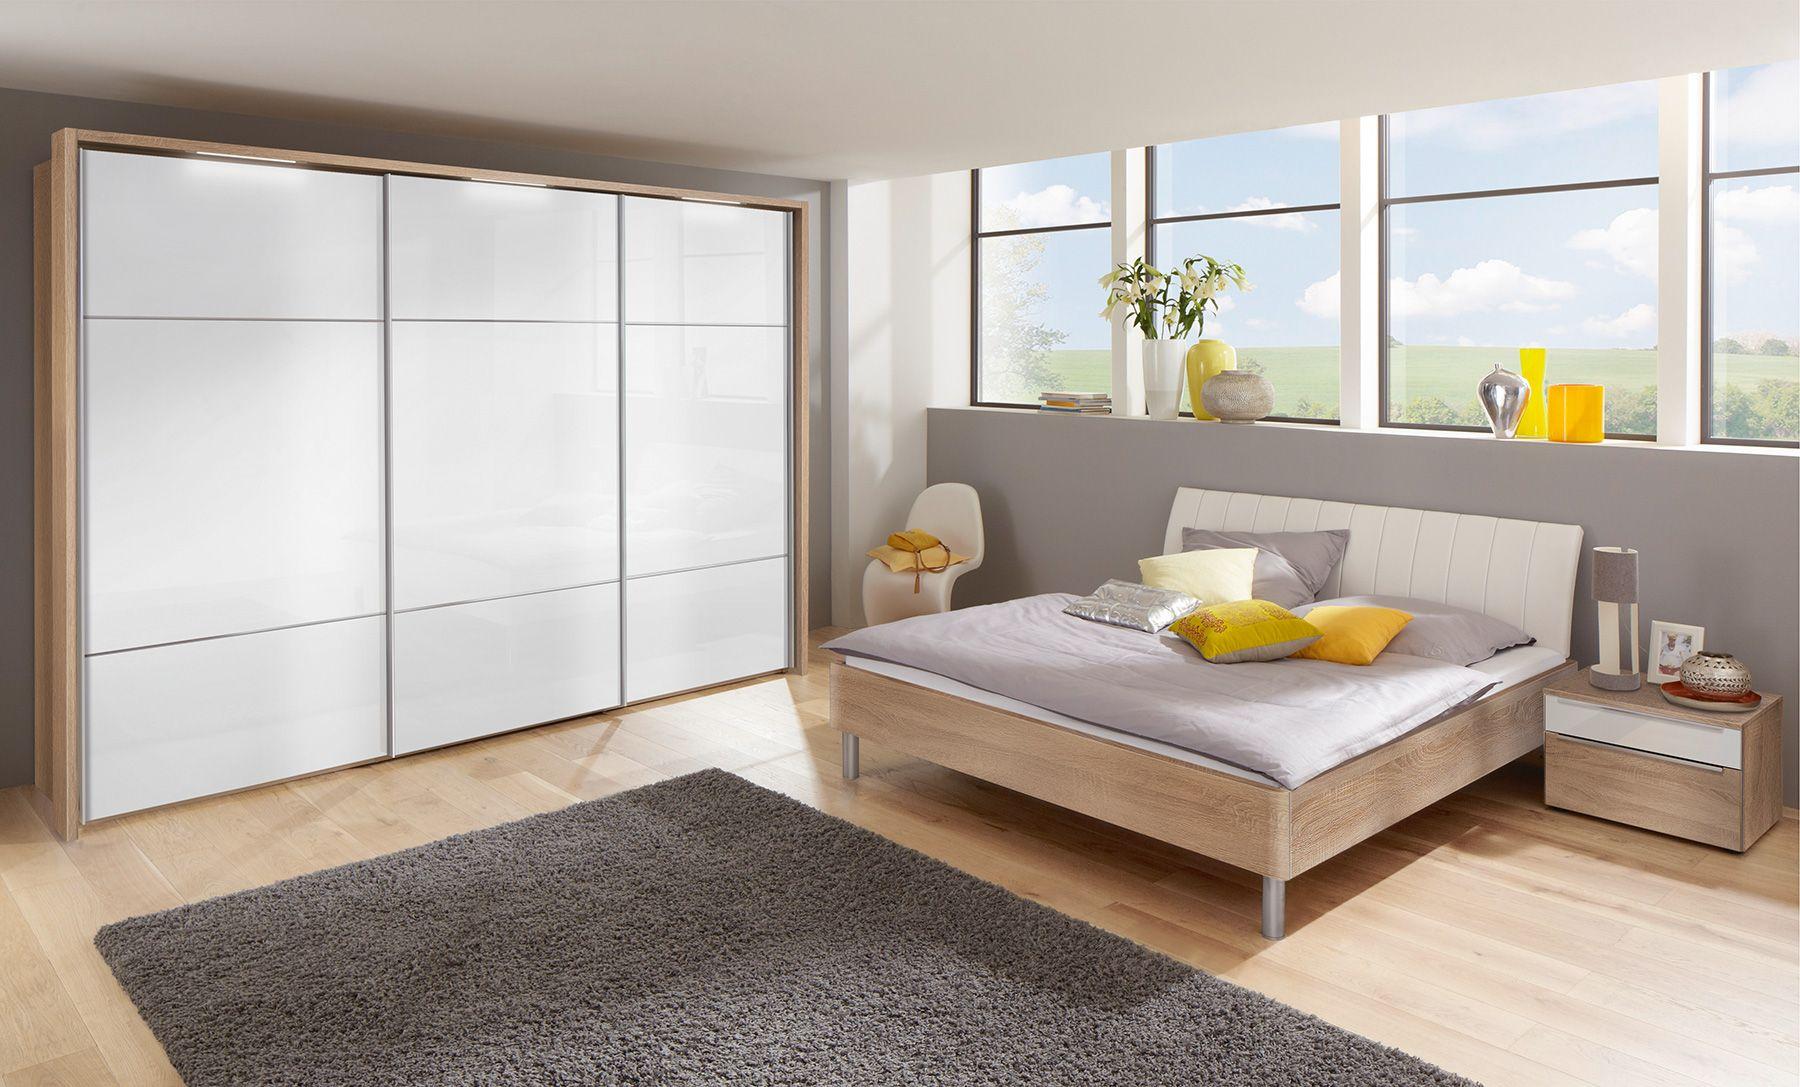 Full Size of Bett Schrank Schrankbett 180x200 Nehl 140 X 200 Mit Zwei Betten Vertikal Sofa Kombination Amazon Ikea Ebay Selber Bauen Set Und Kombiniert Apartment Bett Bett Schrank